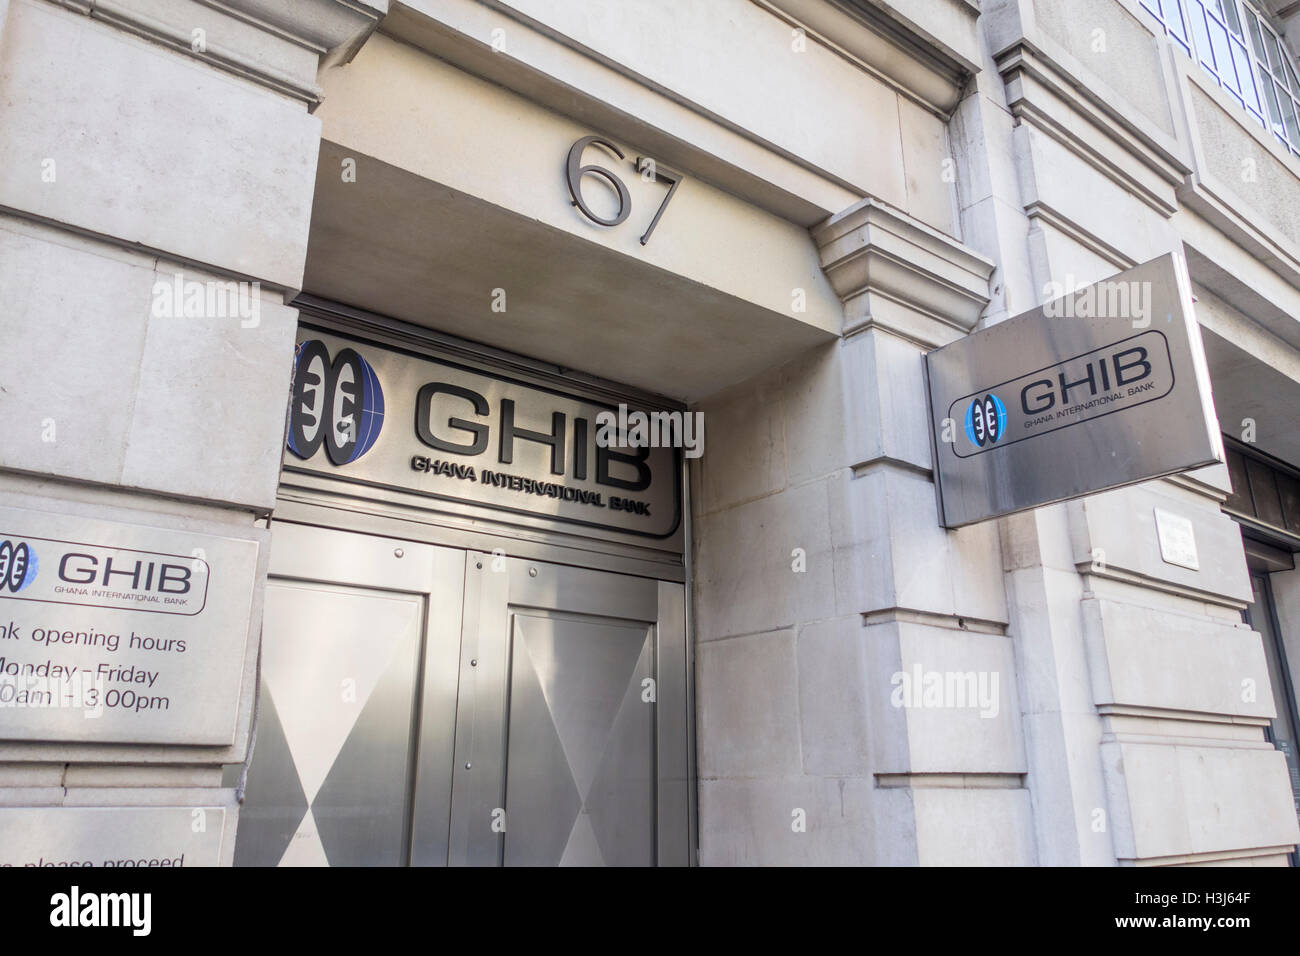 Ghana International Bank sign, Cheepside, London, UK - Stock Image